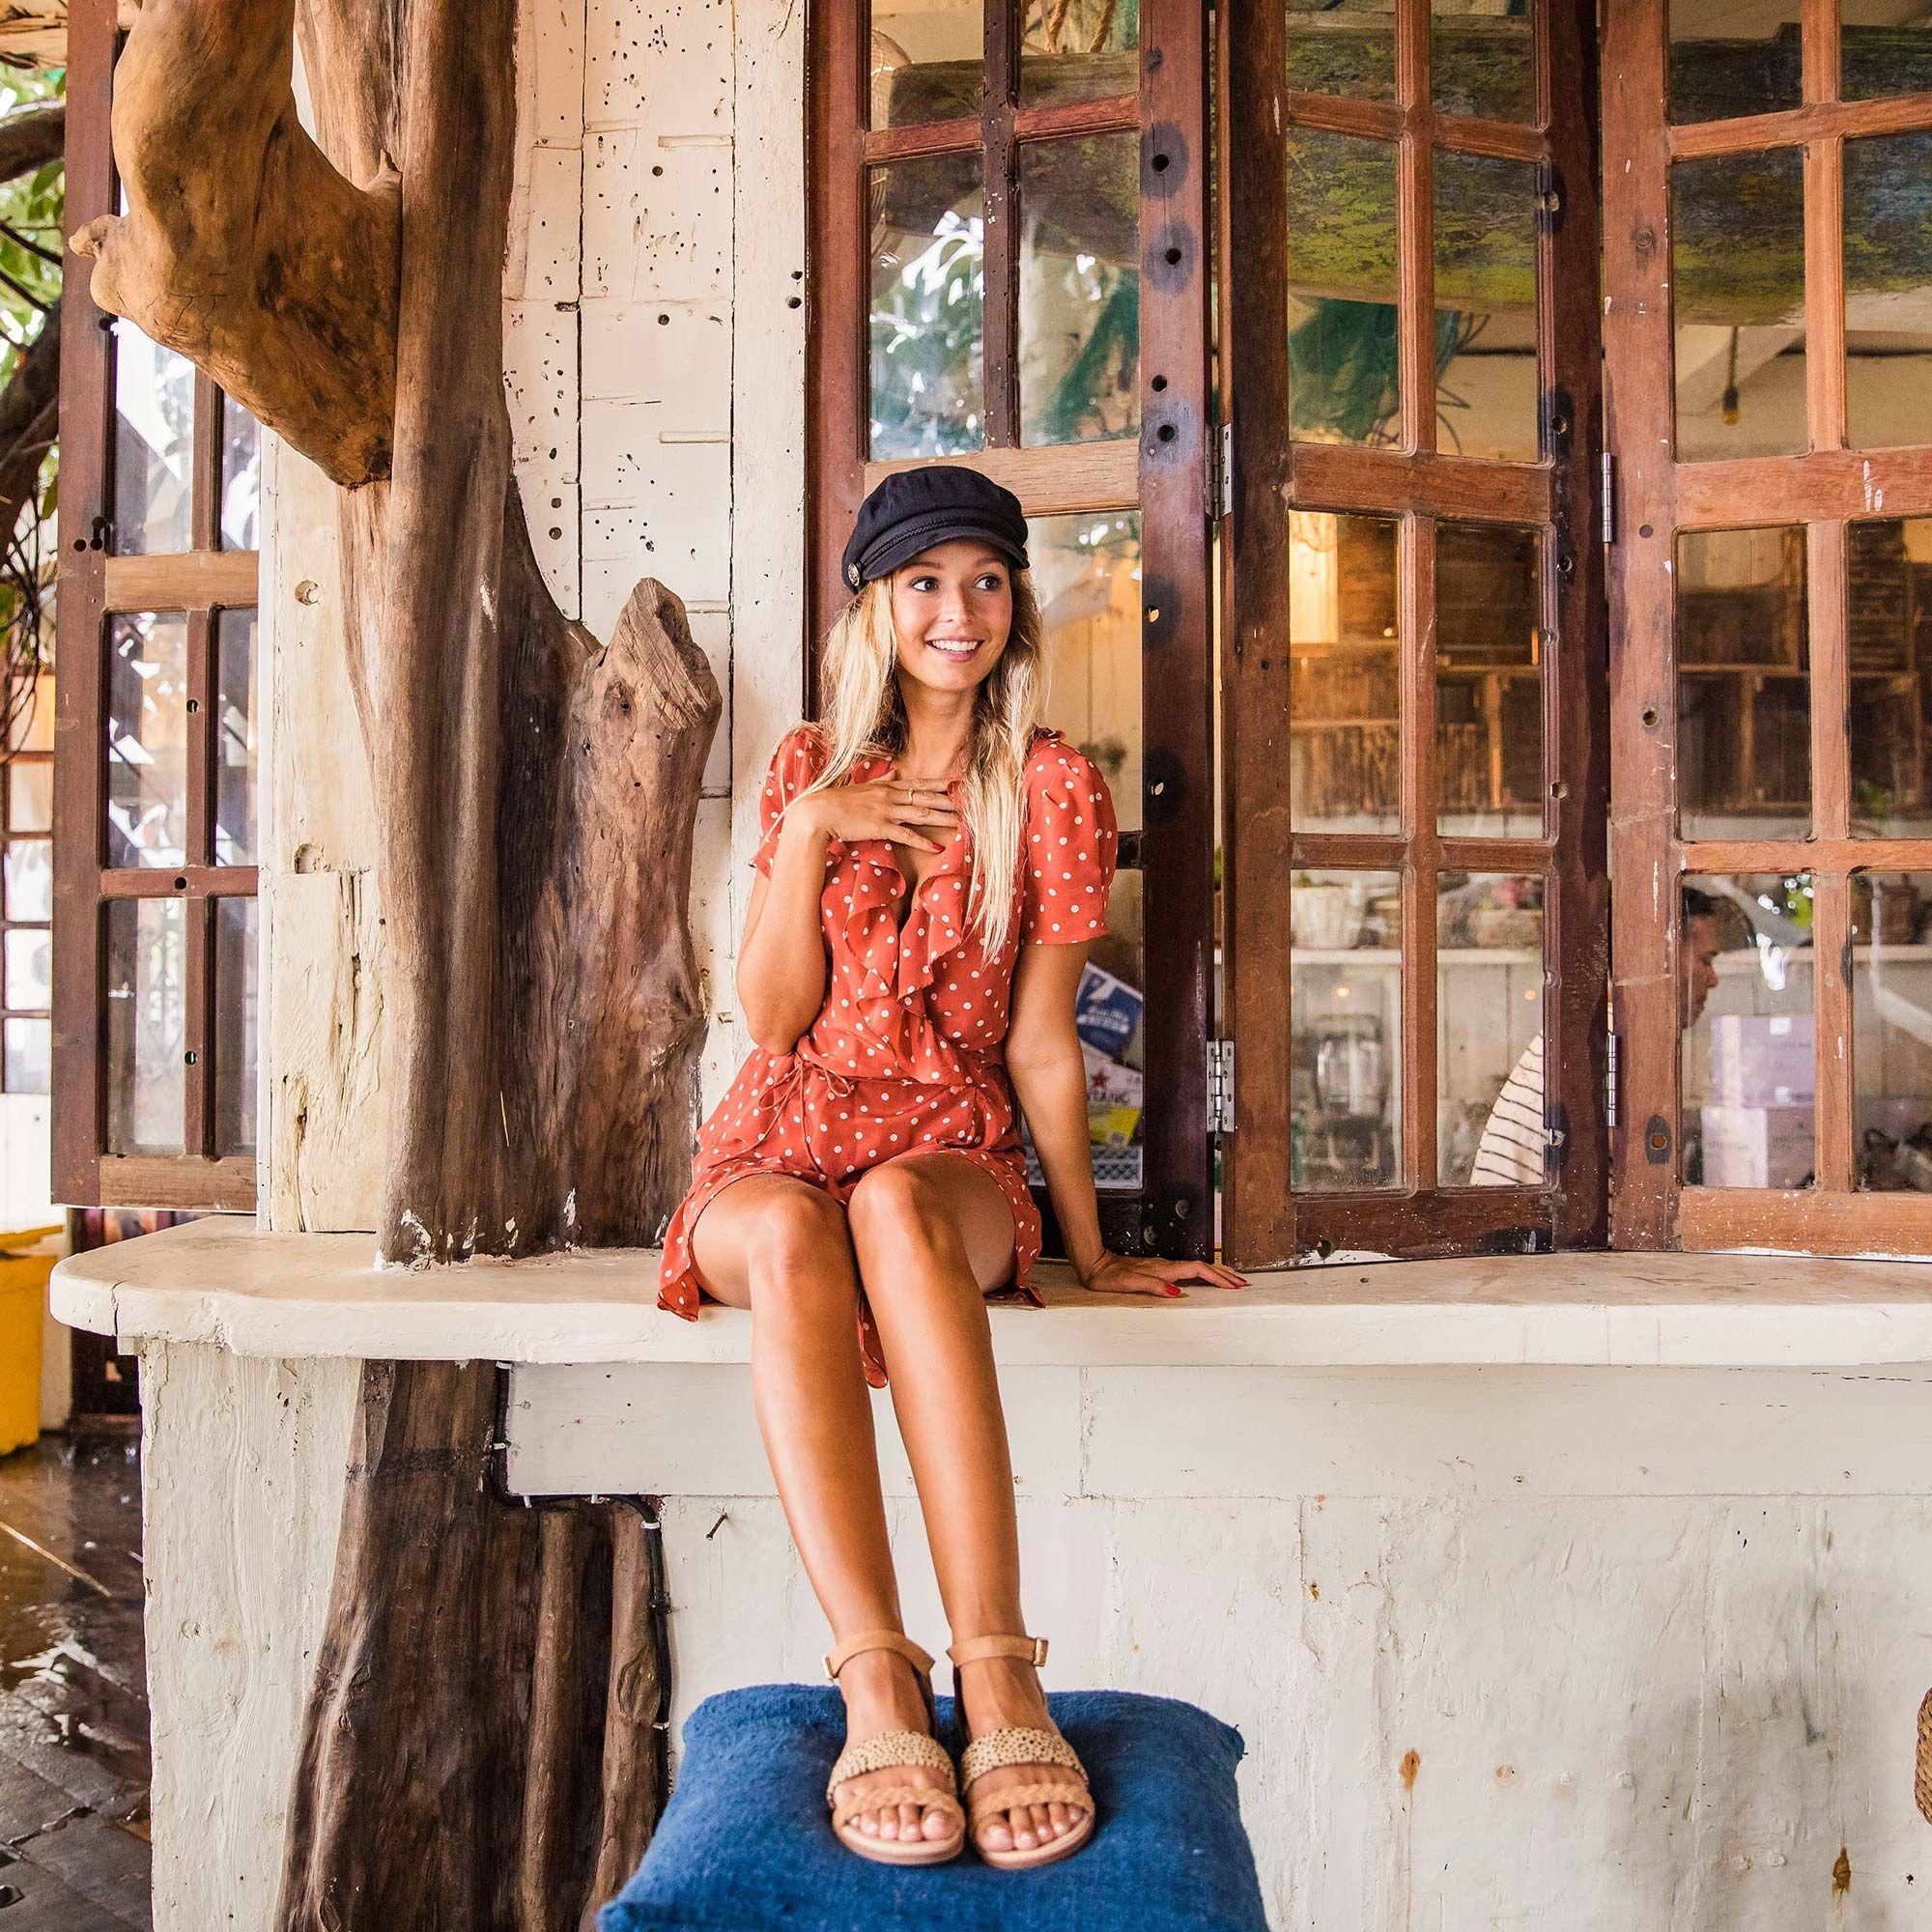 Bared_Footwear_La_Brisa_Bali_Travel_Summer_Womens_Campaign_Partridge_Tan_Spot_Sandals